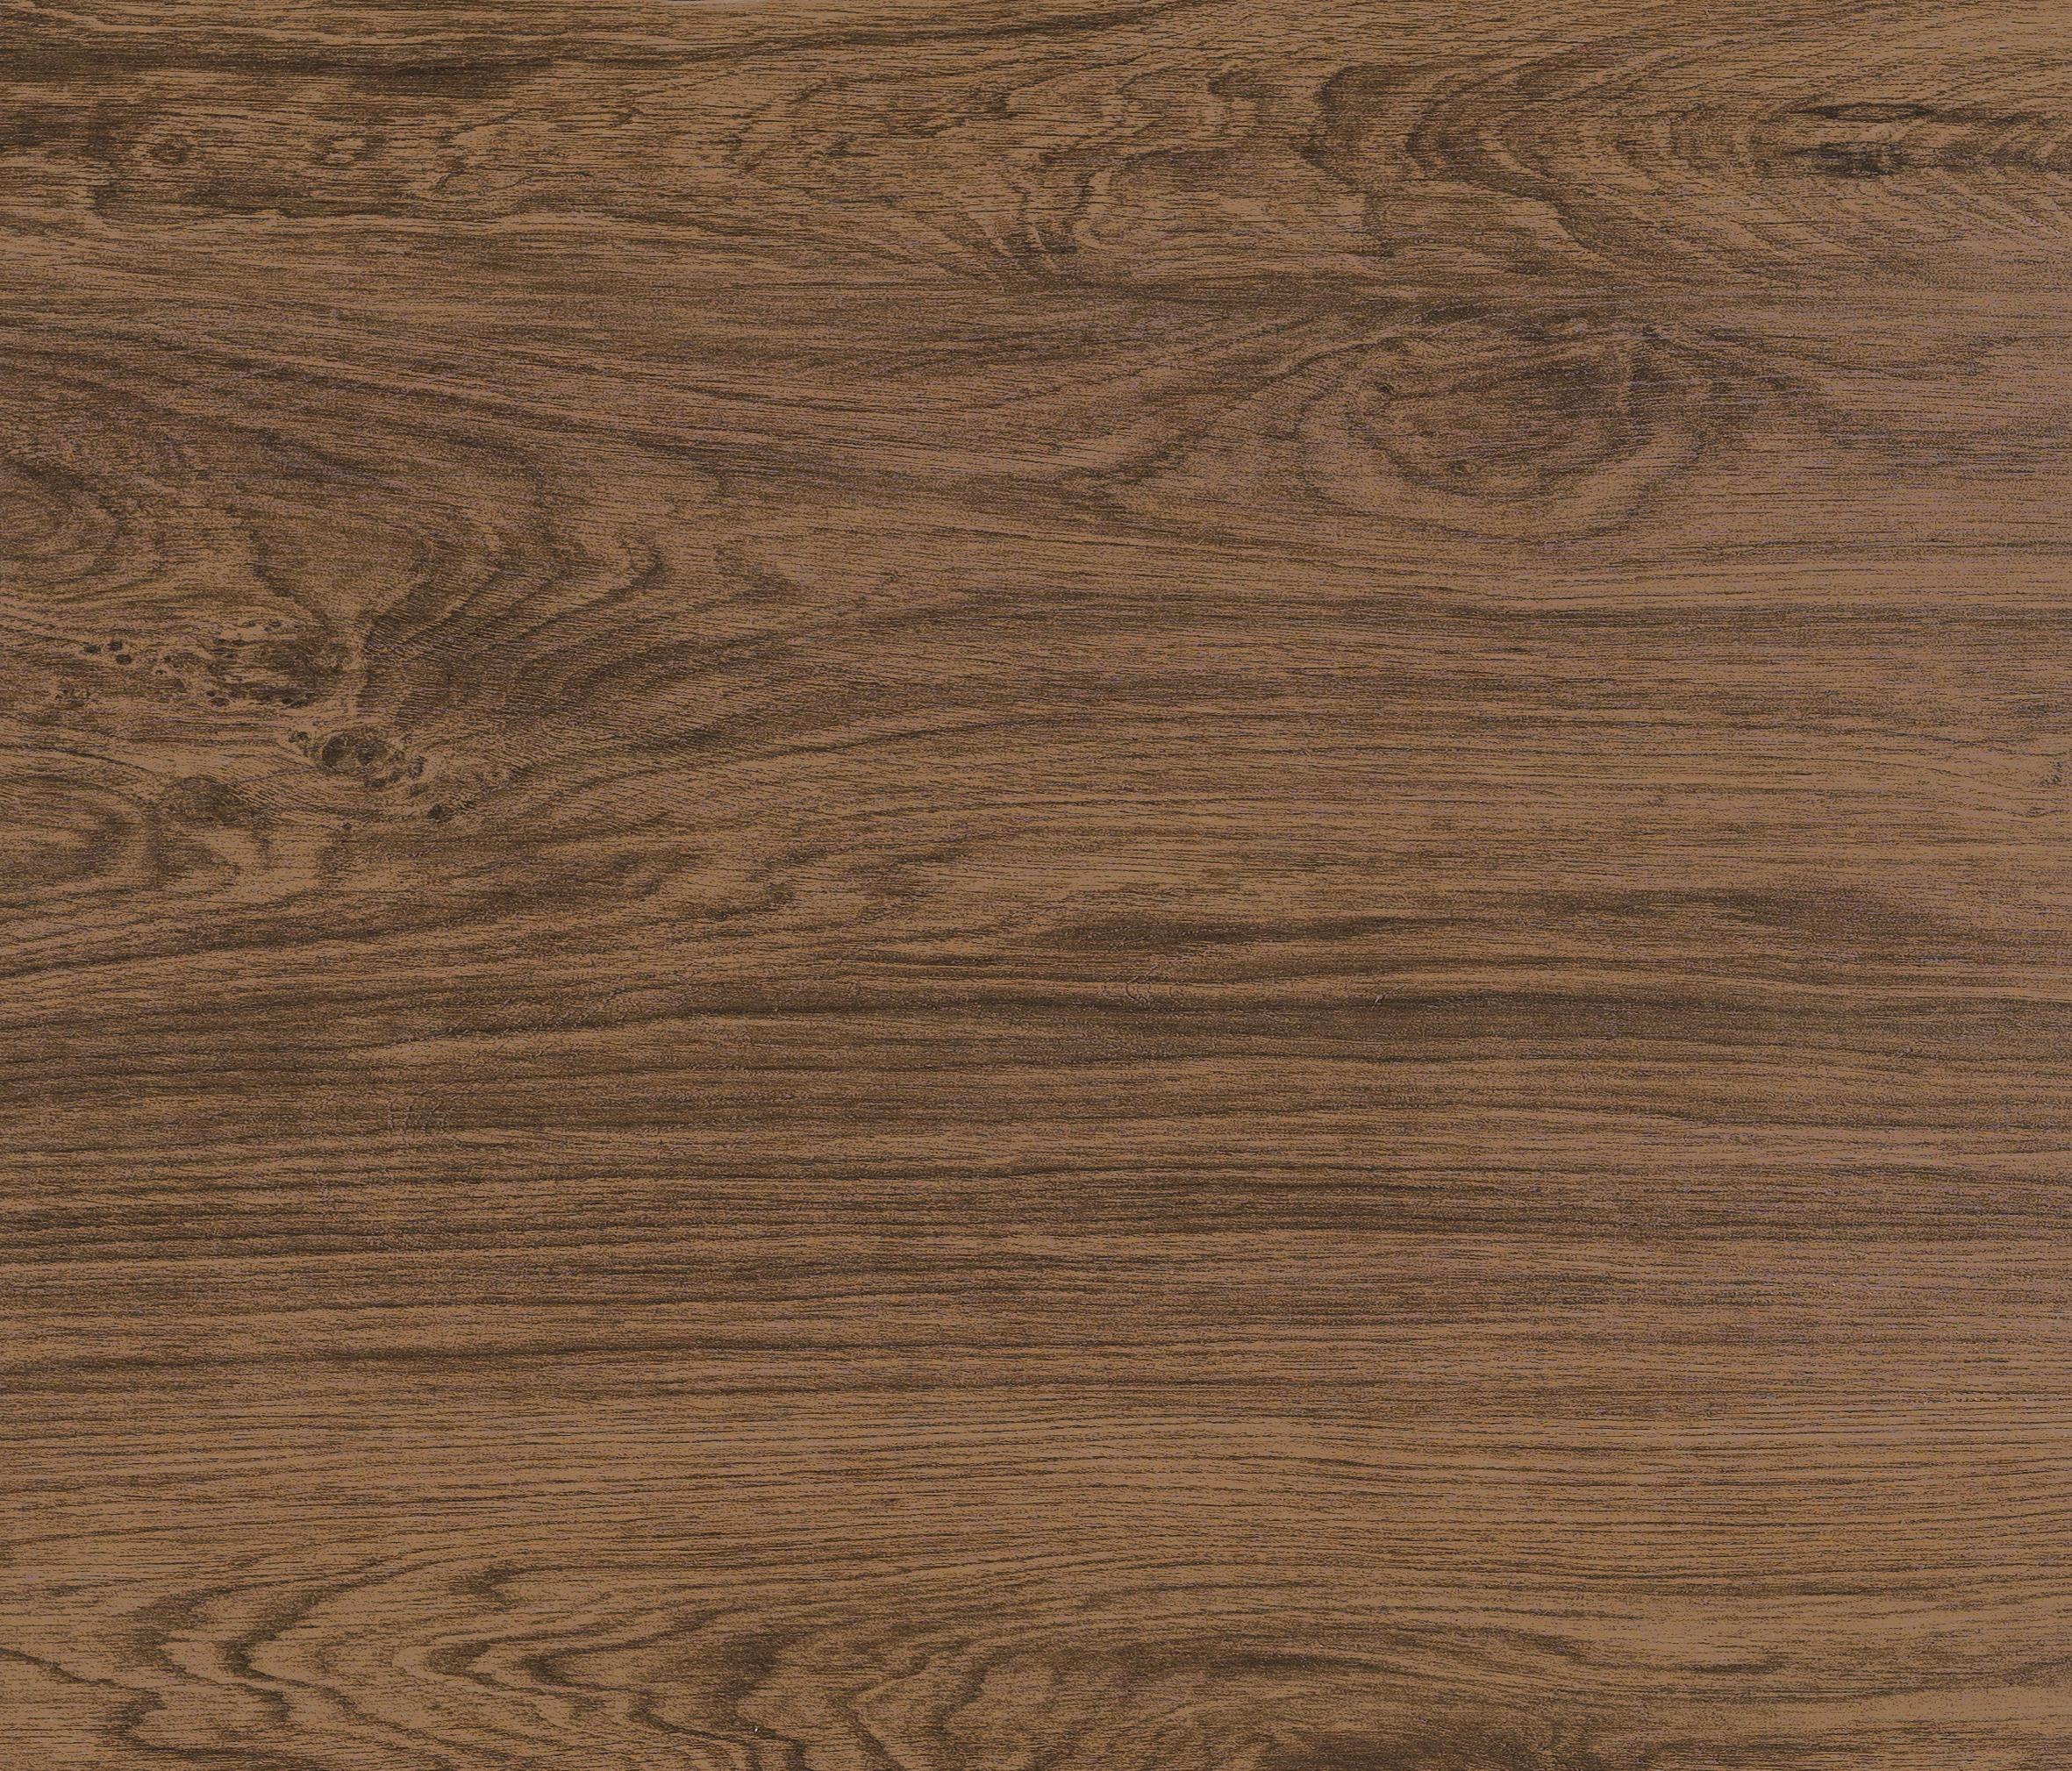 Slimtech Wood Stock Coffee Wood Ceramic Panels From